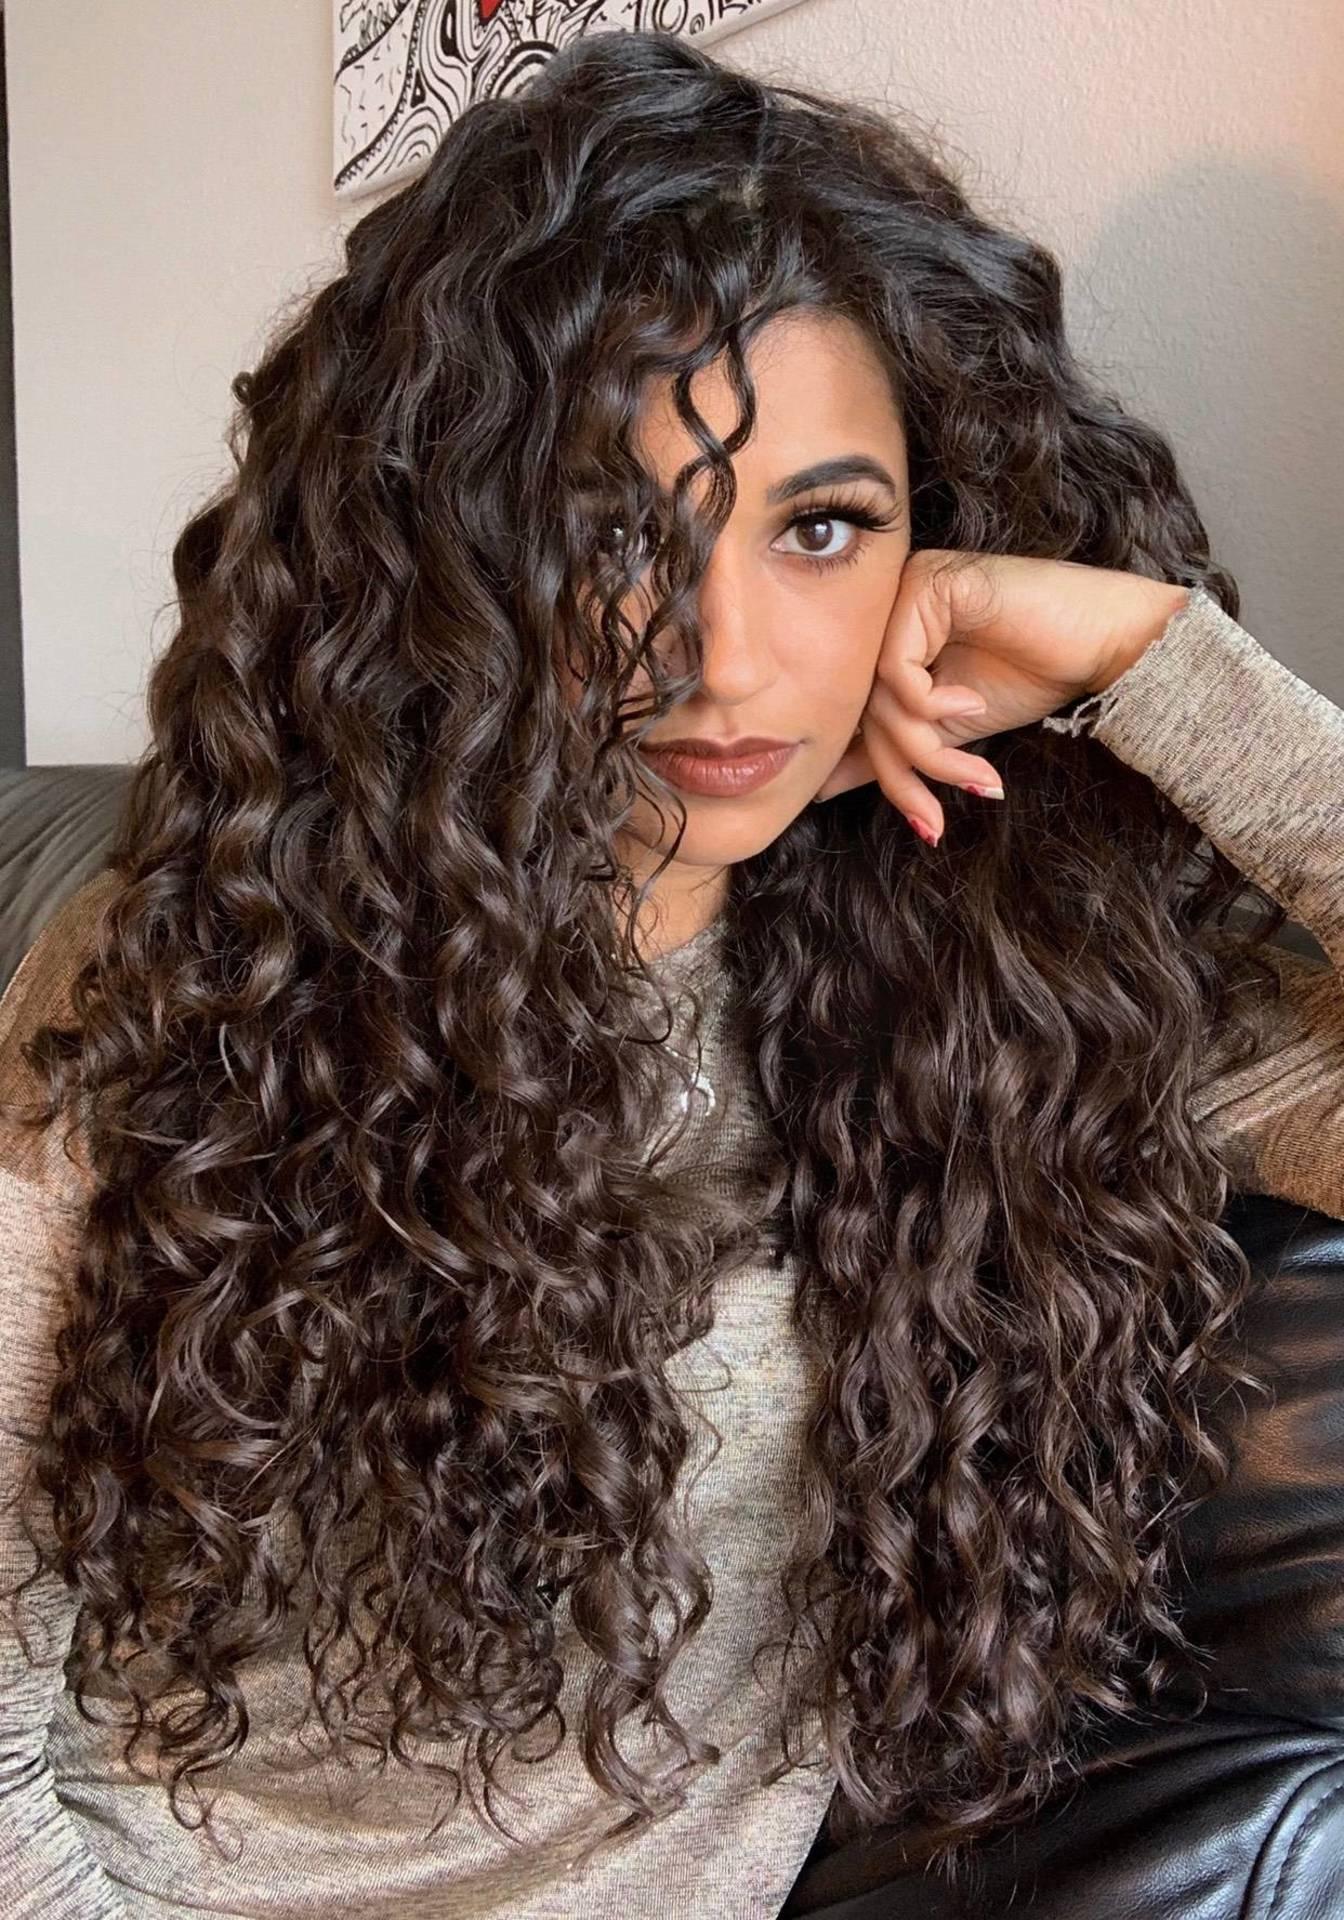 Goddess of Curls // Spisha image